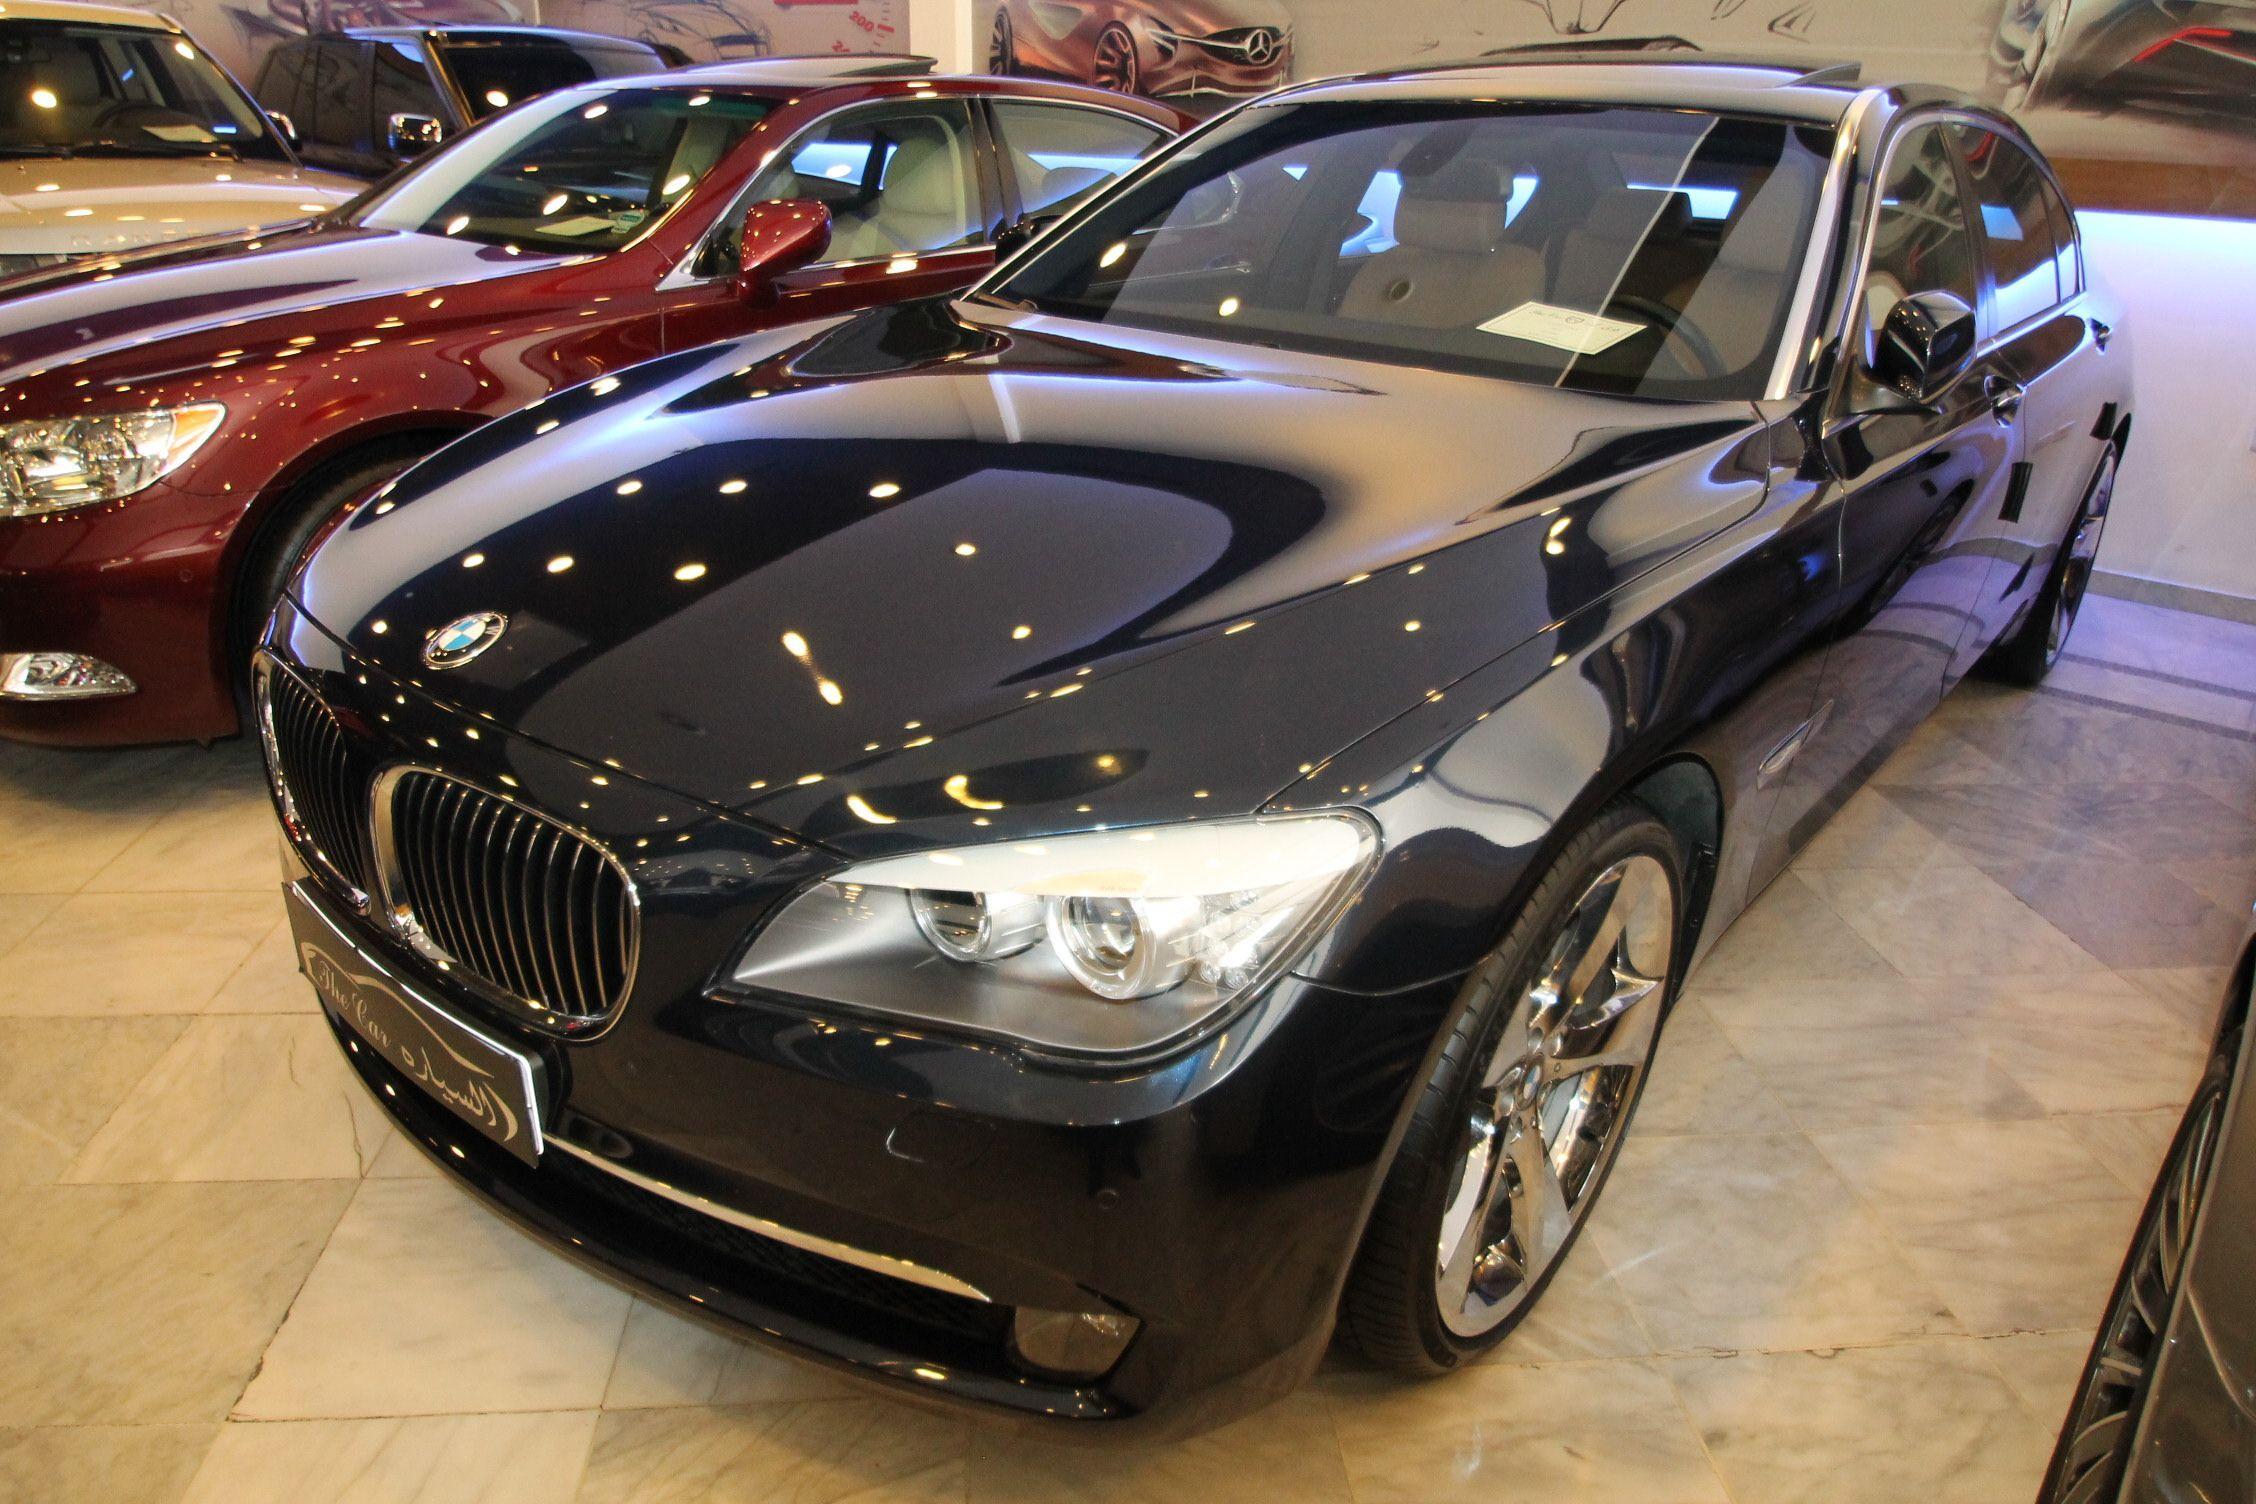 Bmw 7 series for sale in jeddah bmw 7 series bmw car